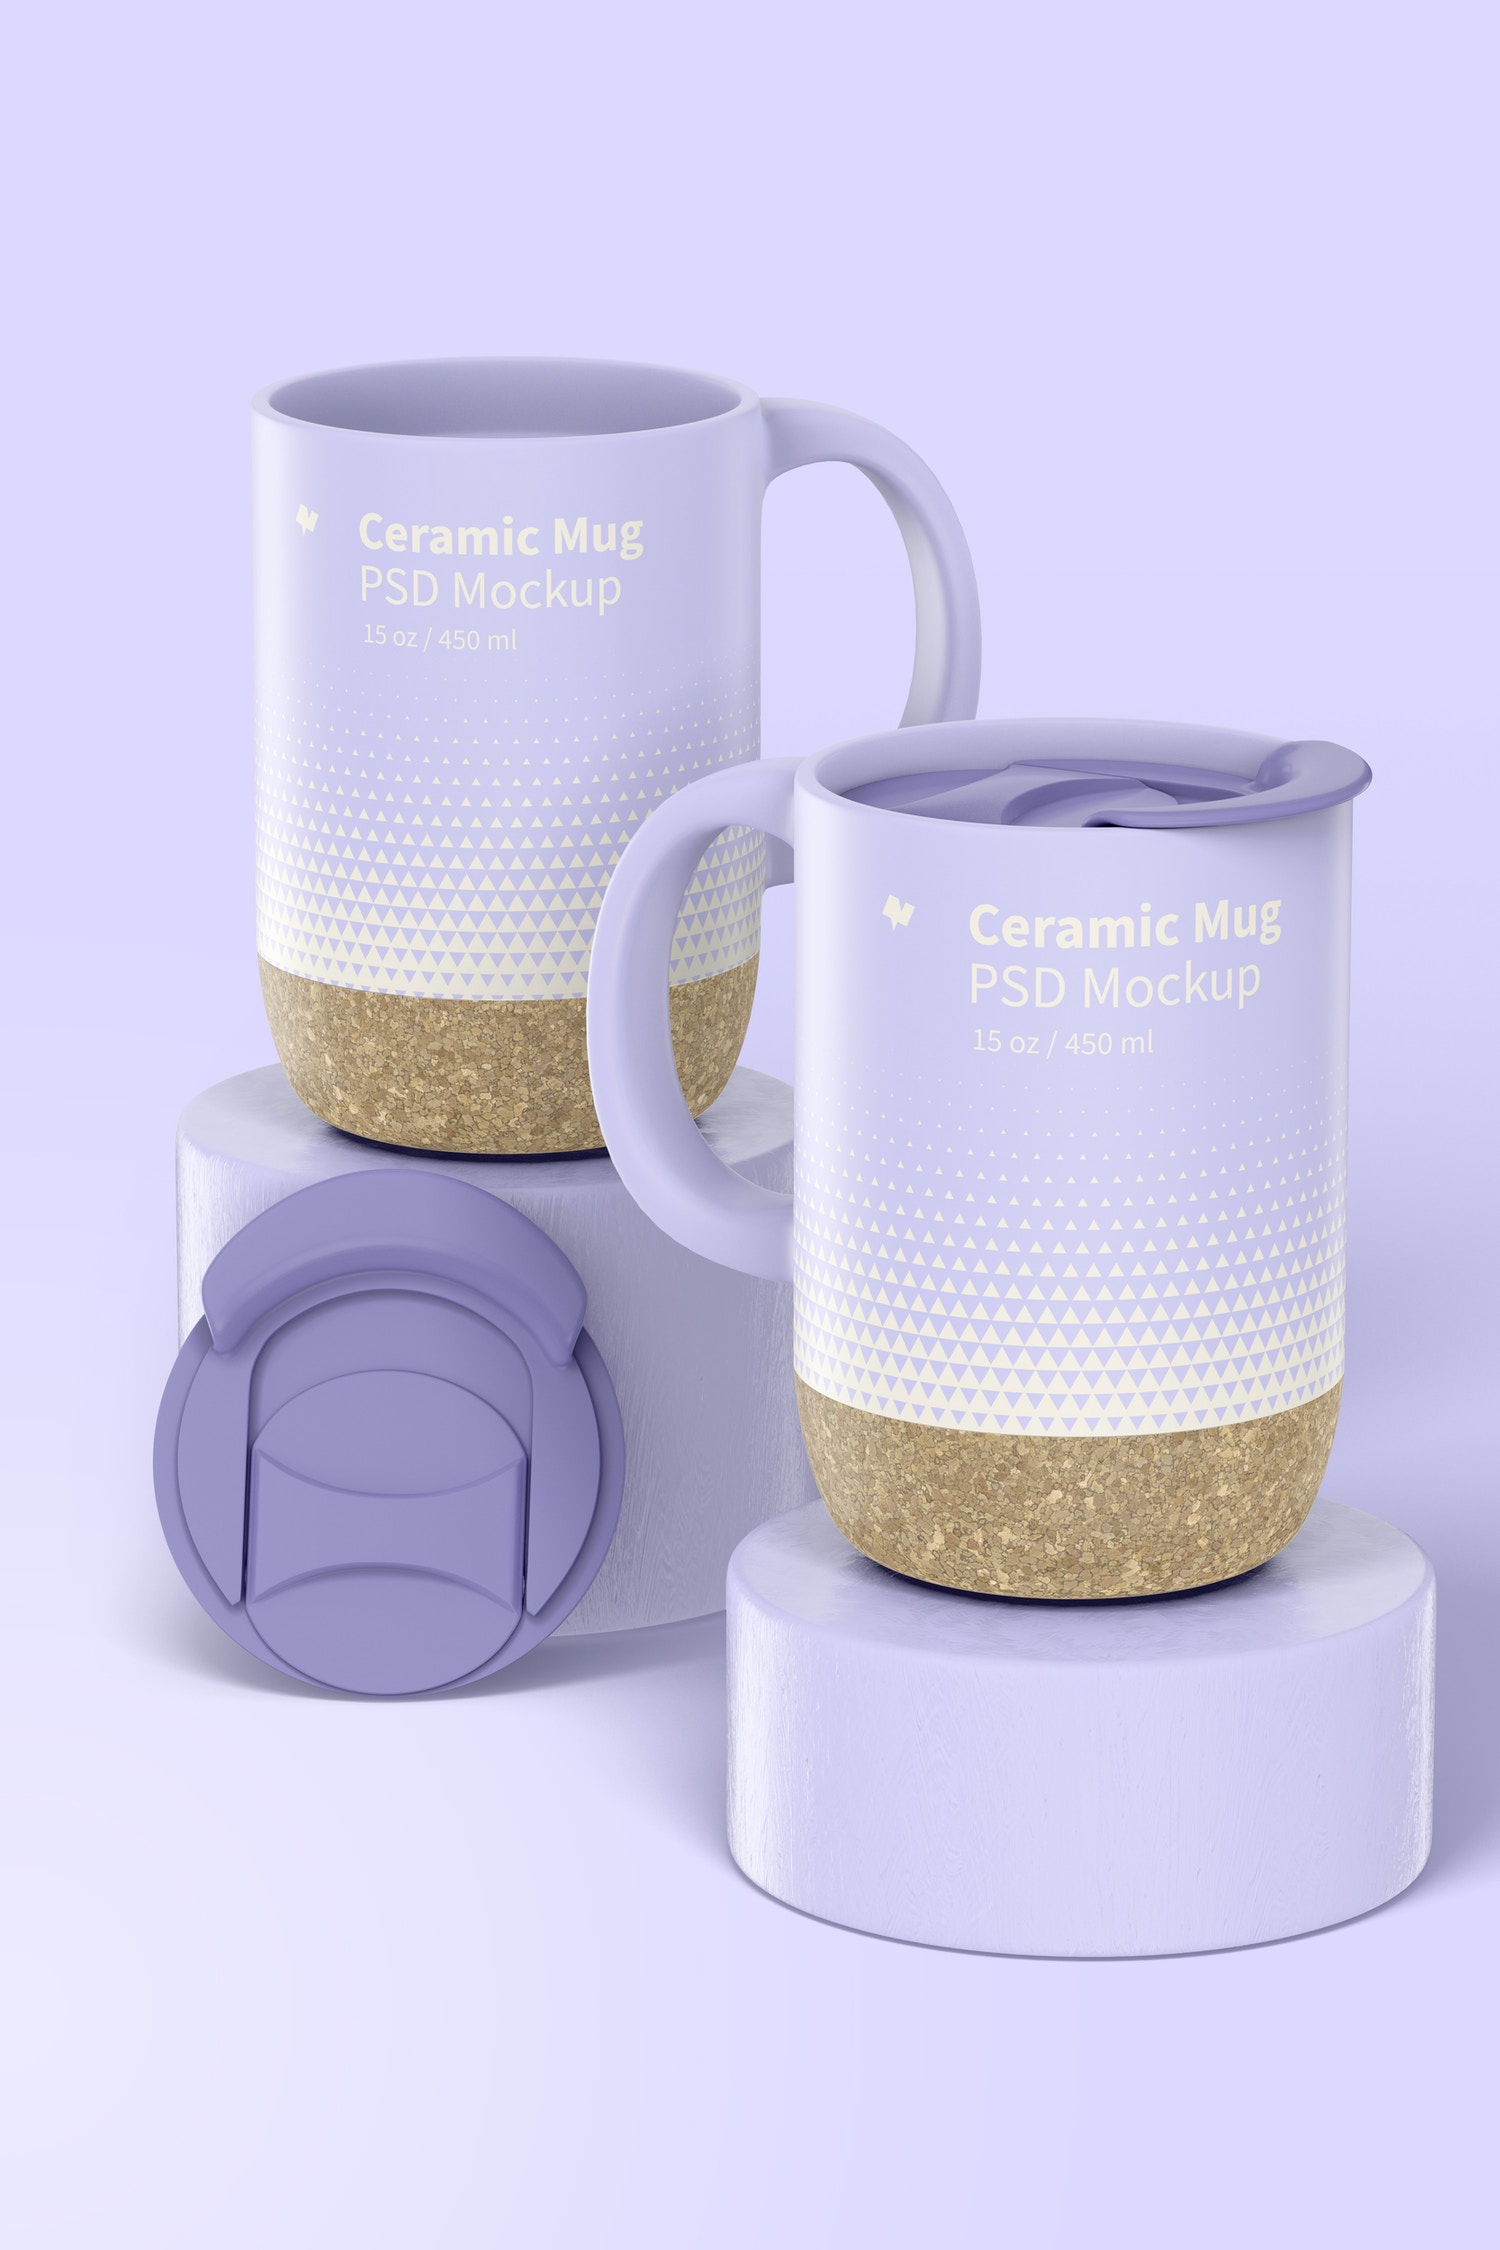 15 oz Ceramic Mugs with Lid Mockup